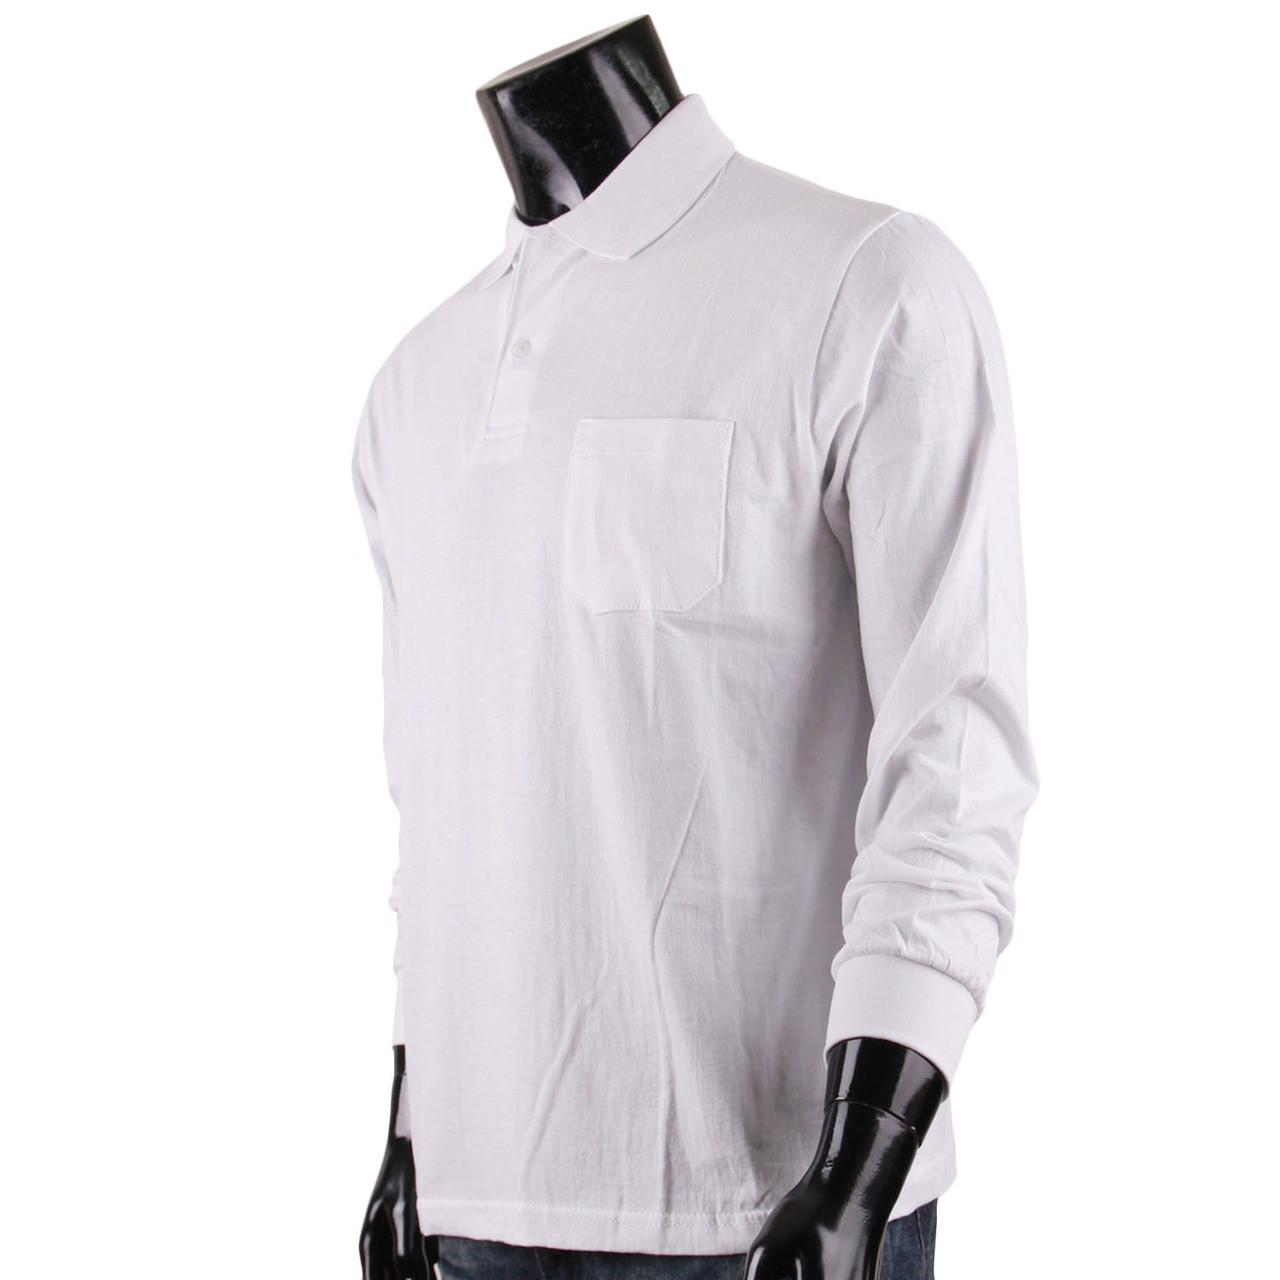 Bcpolo Mens Long Sleeves Cotton Solid Polo Shirtwhite